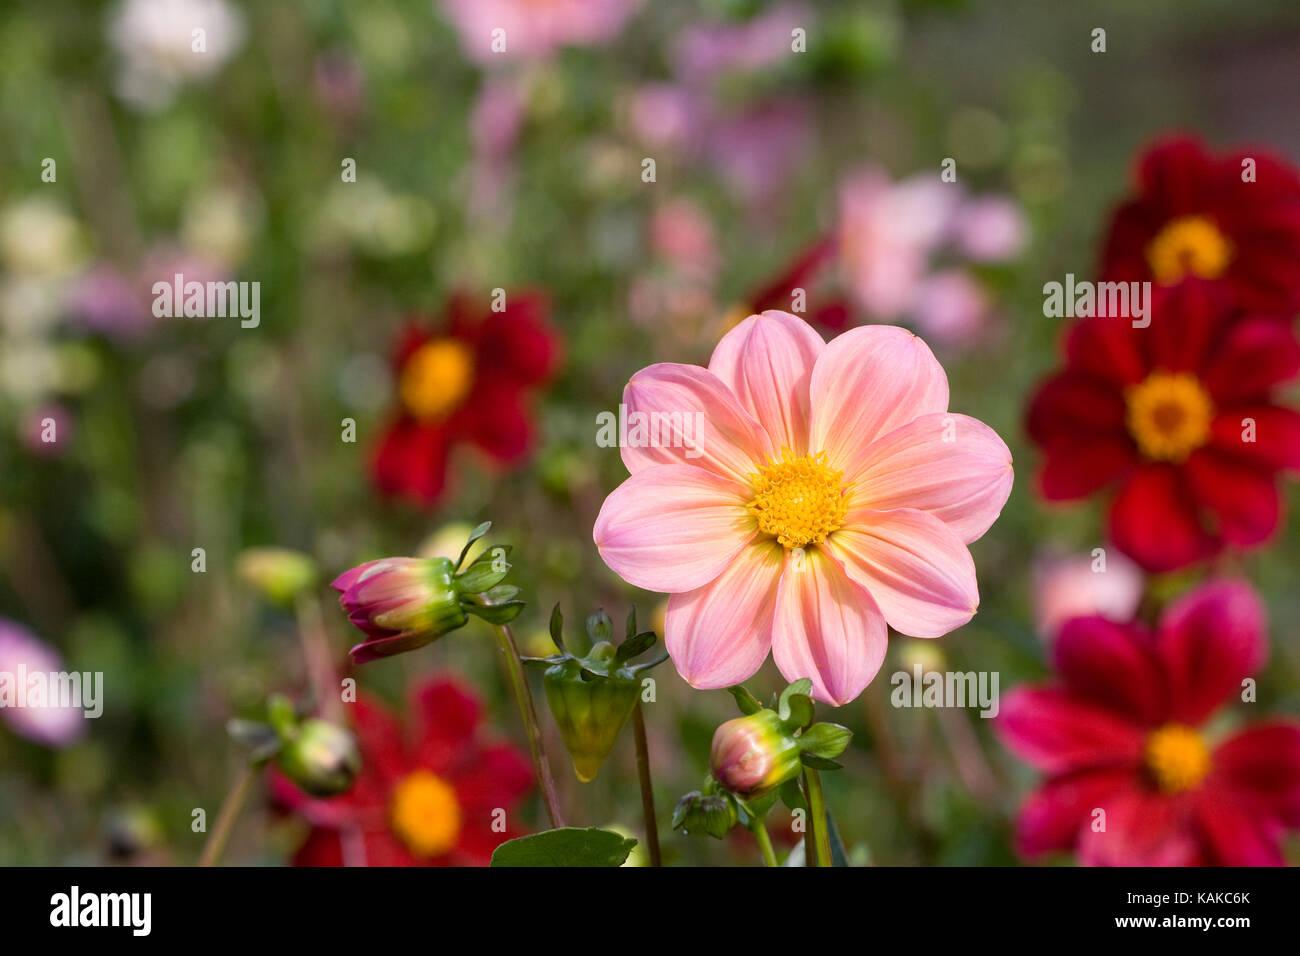 Dahlia 'Rachel de Thame' flowers. - Stock Image